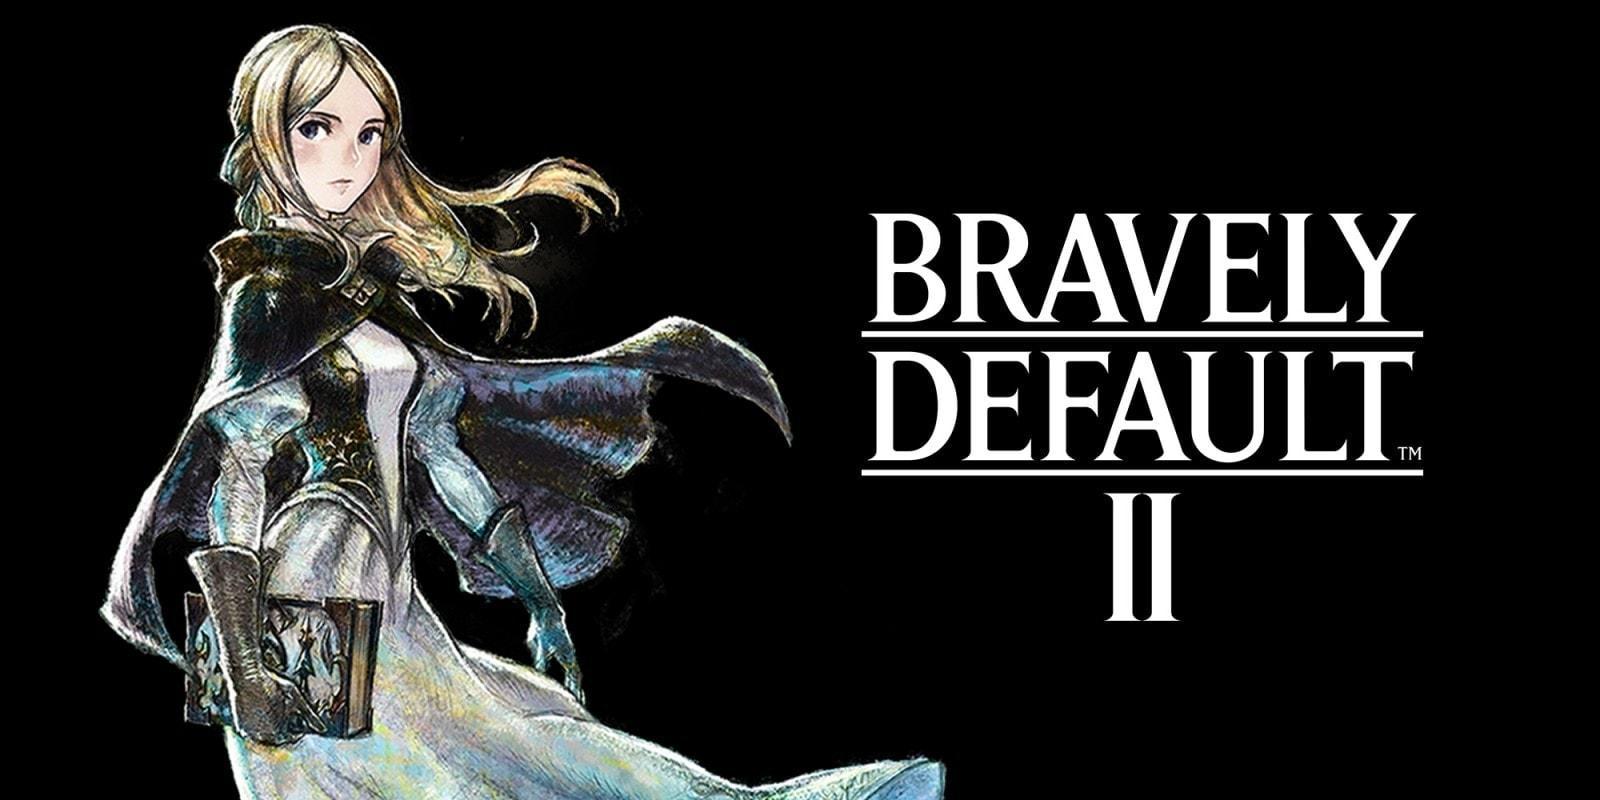 Bravely Default II